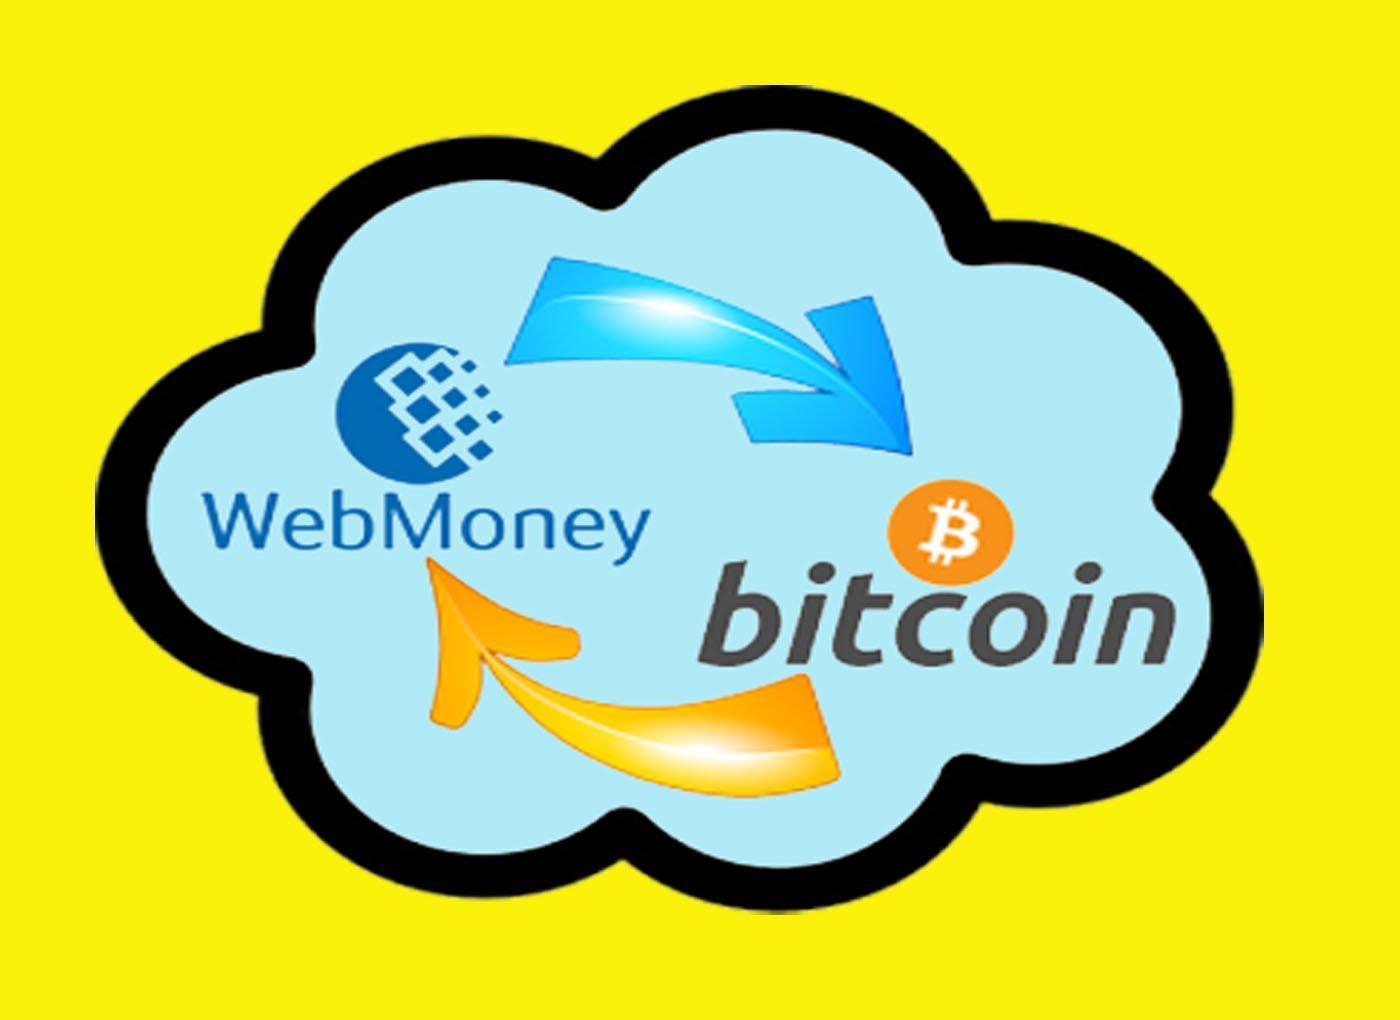 Как купить Биткоин за Вебмани